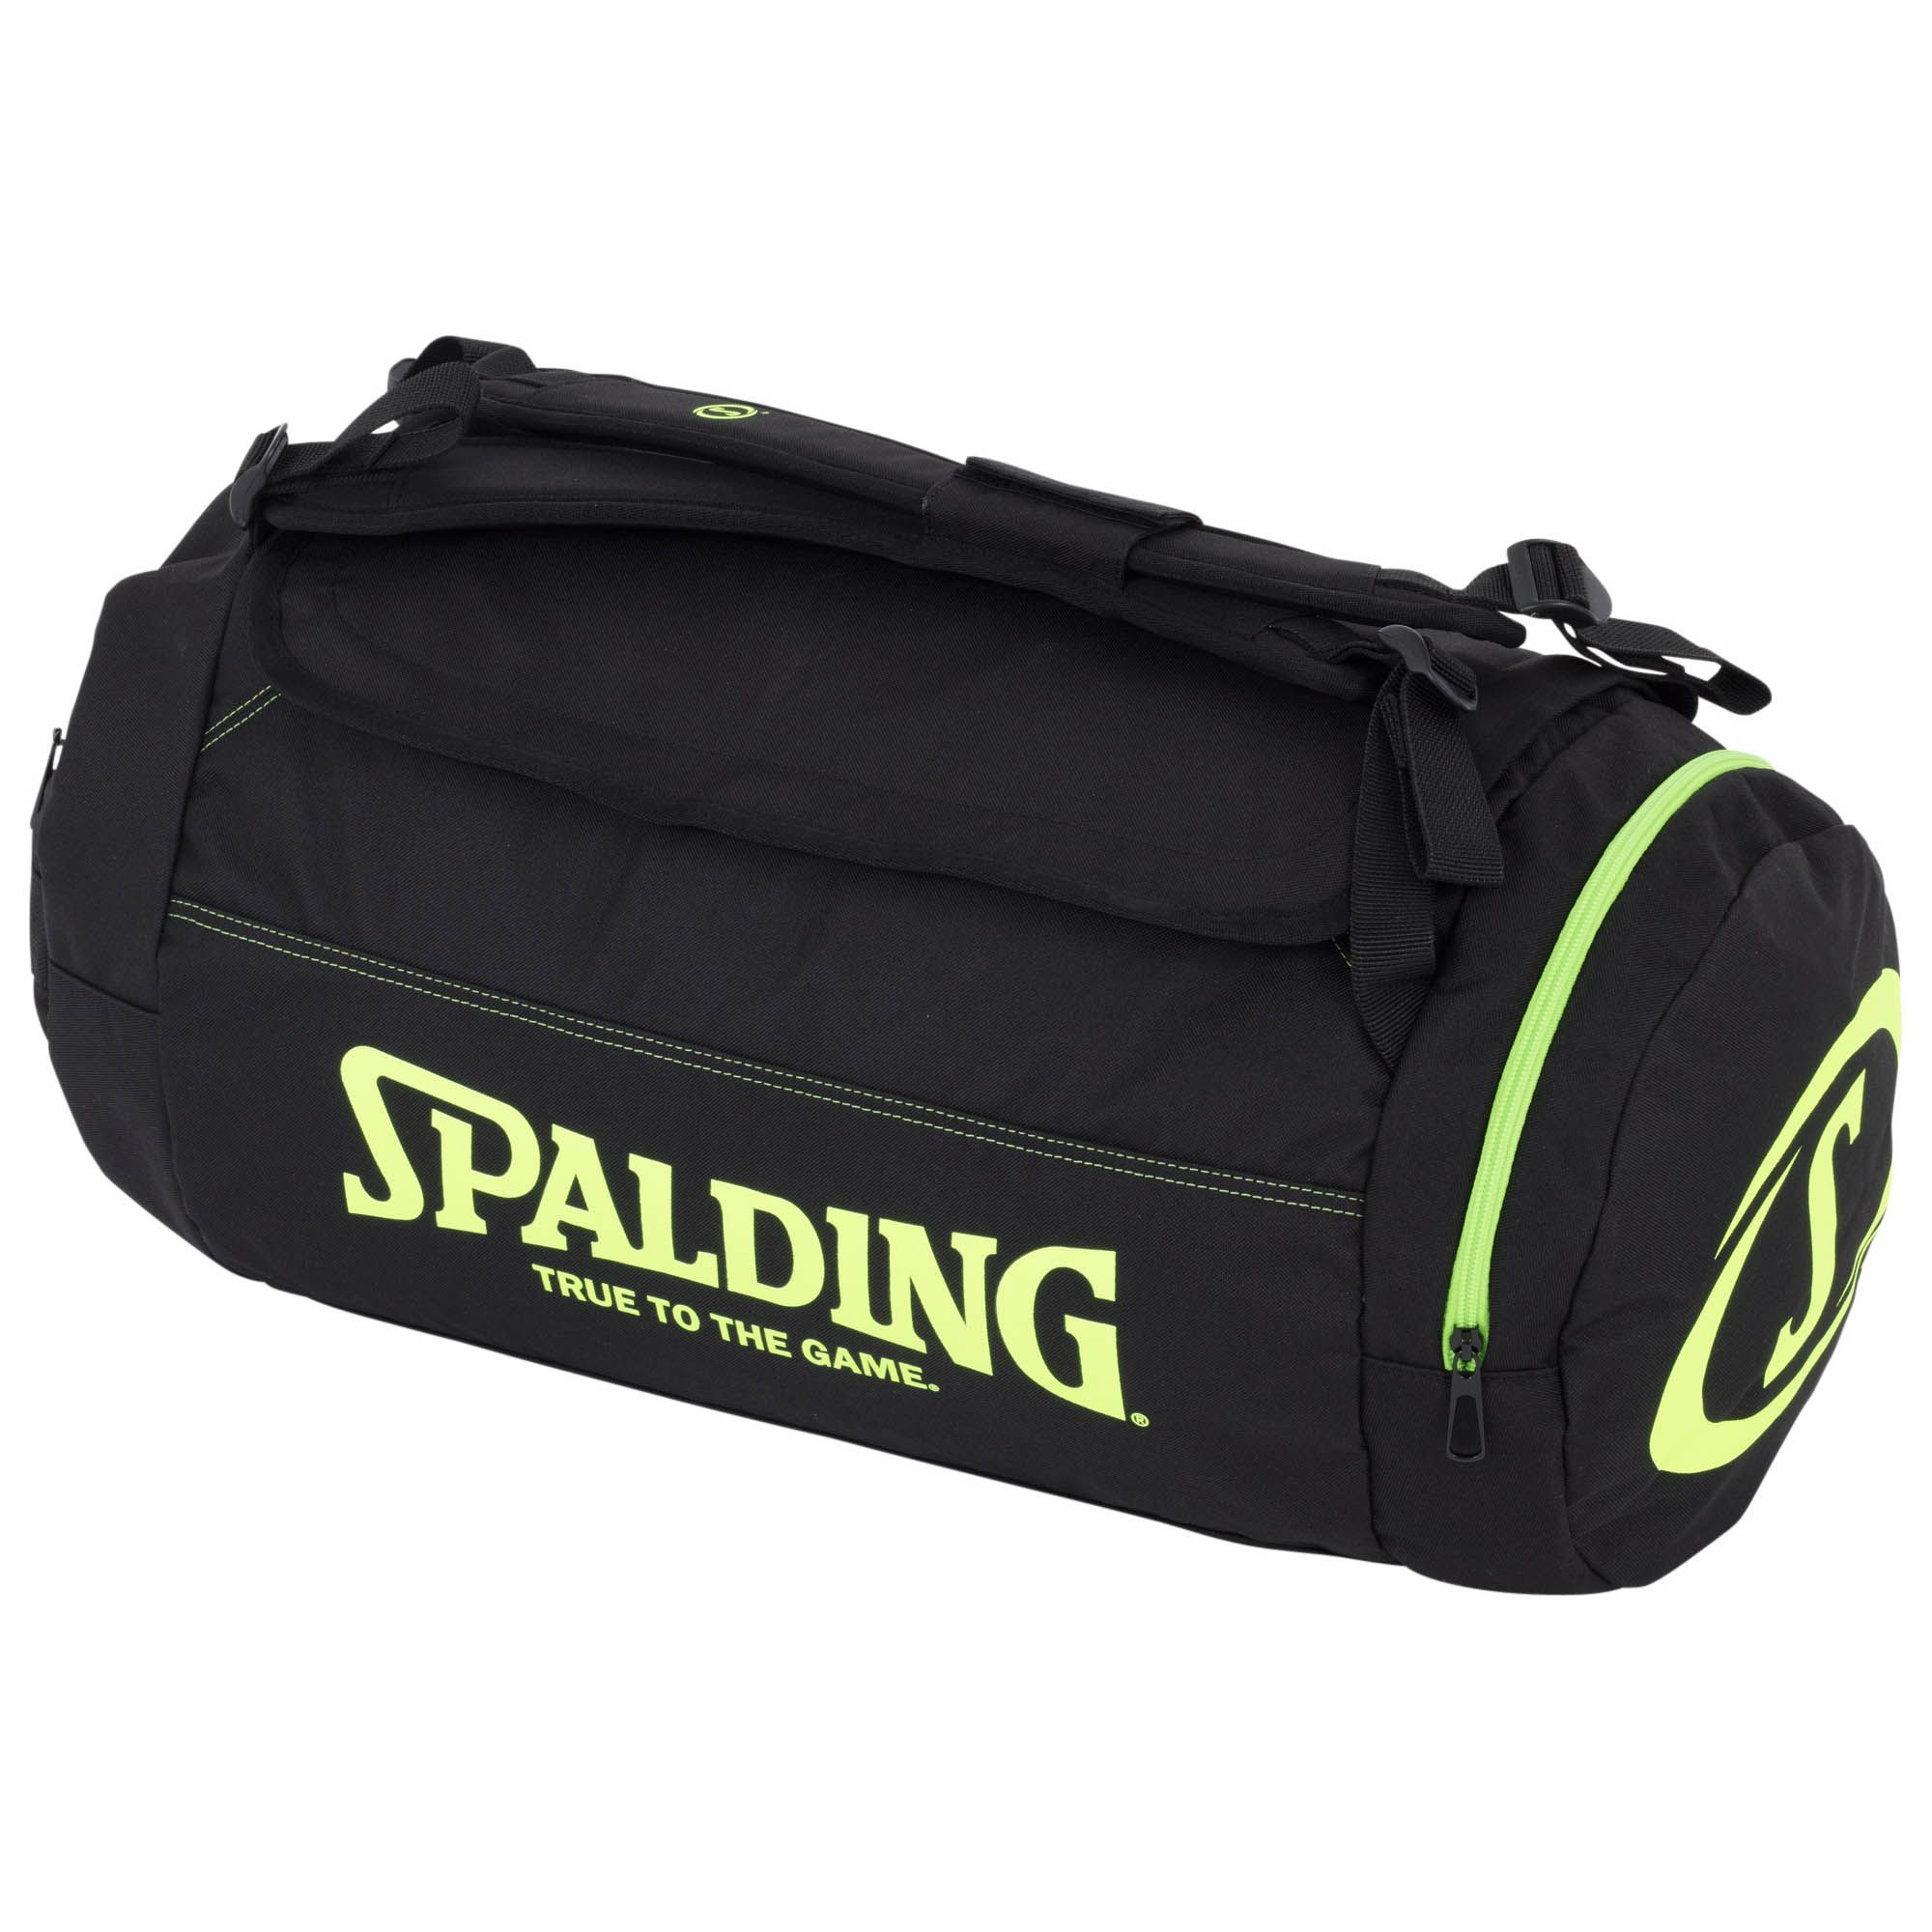 Spalding Duffle Bag - Sweatband.com